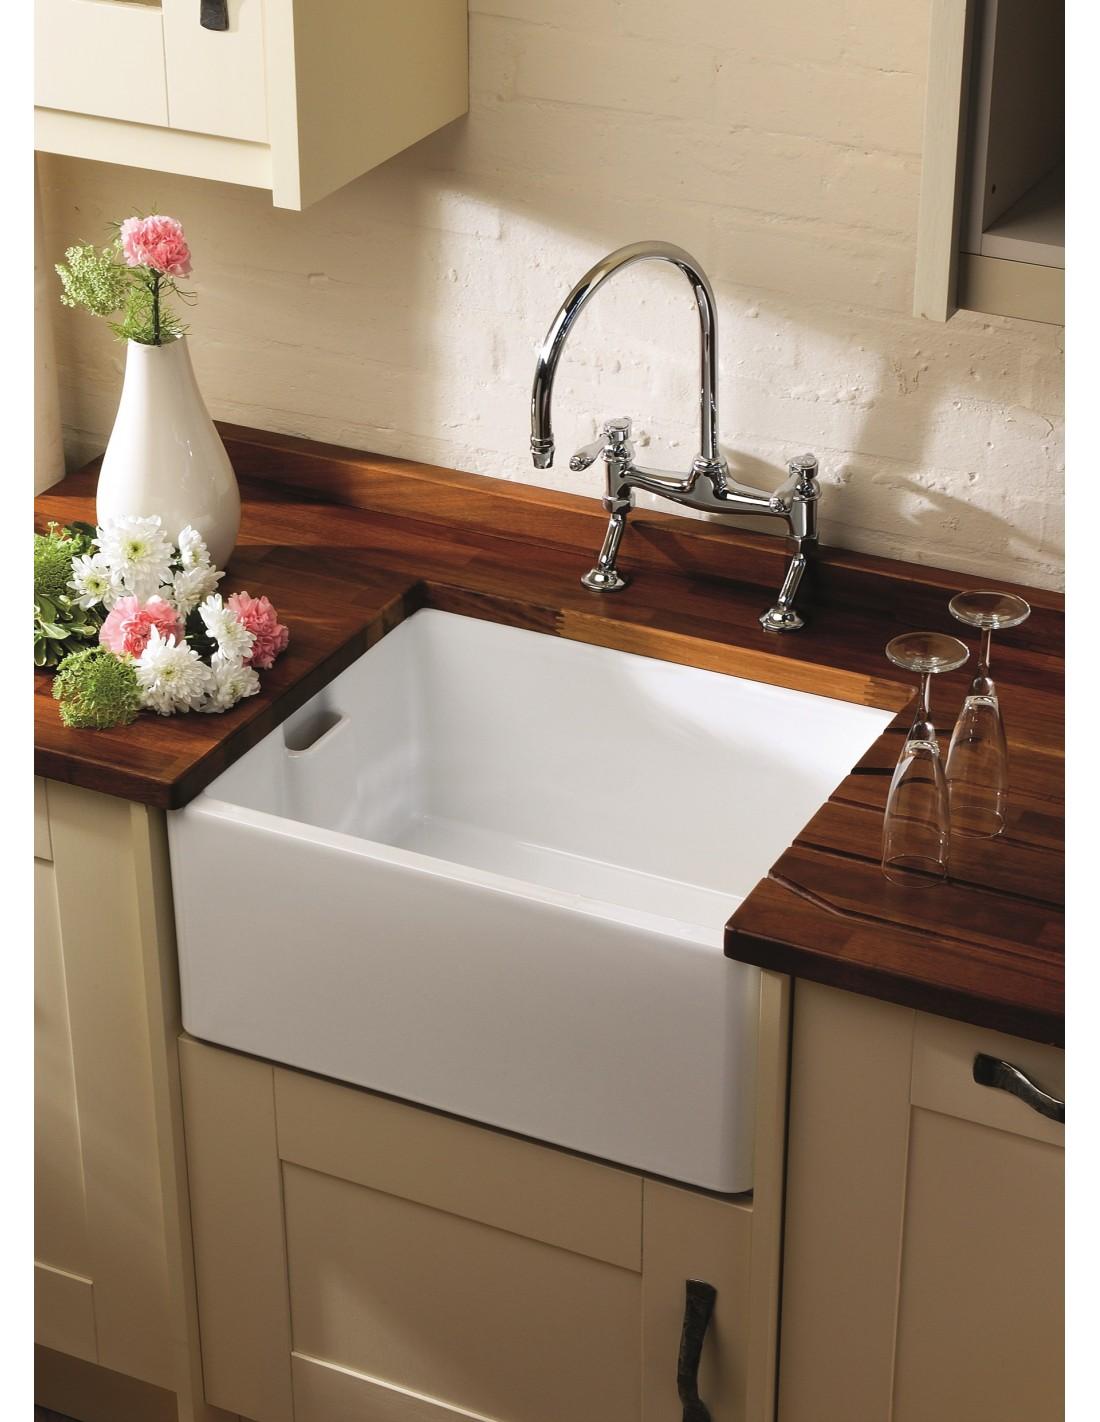 Be600 Shaws Belfast Apron Kitchen Sink White Gloss 60cm Width